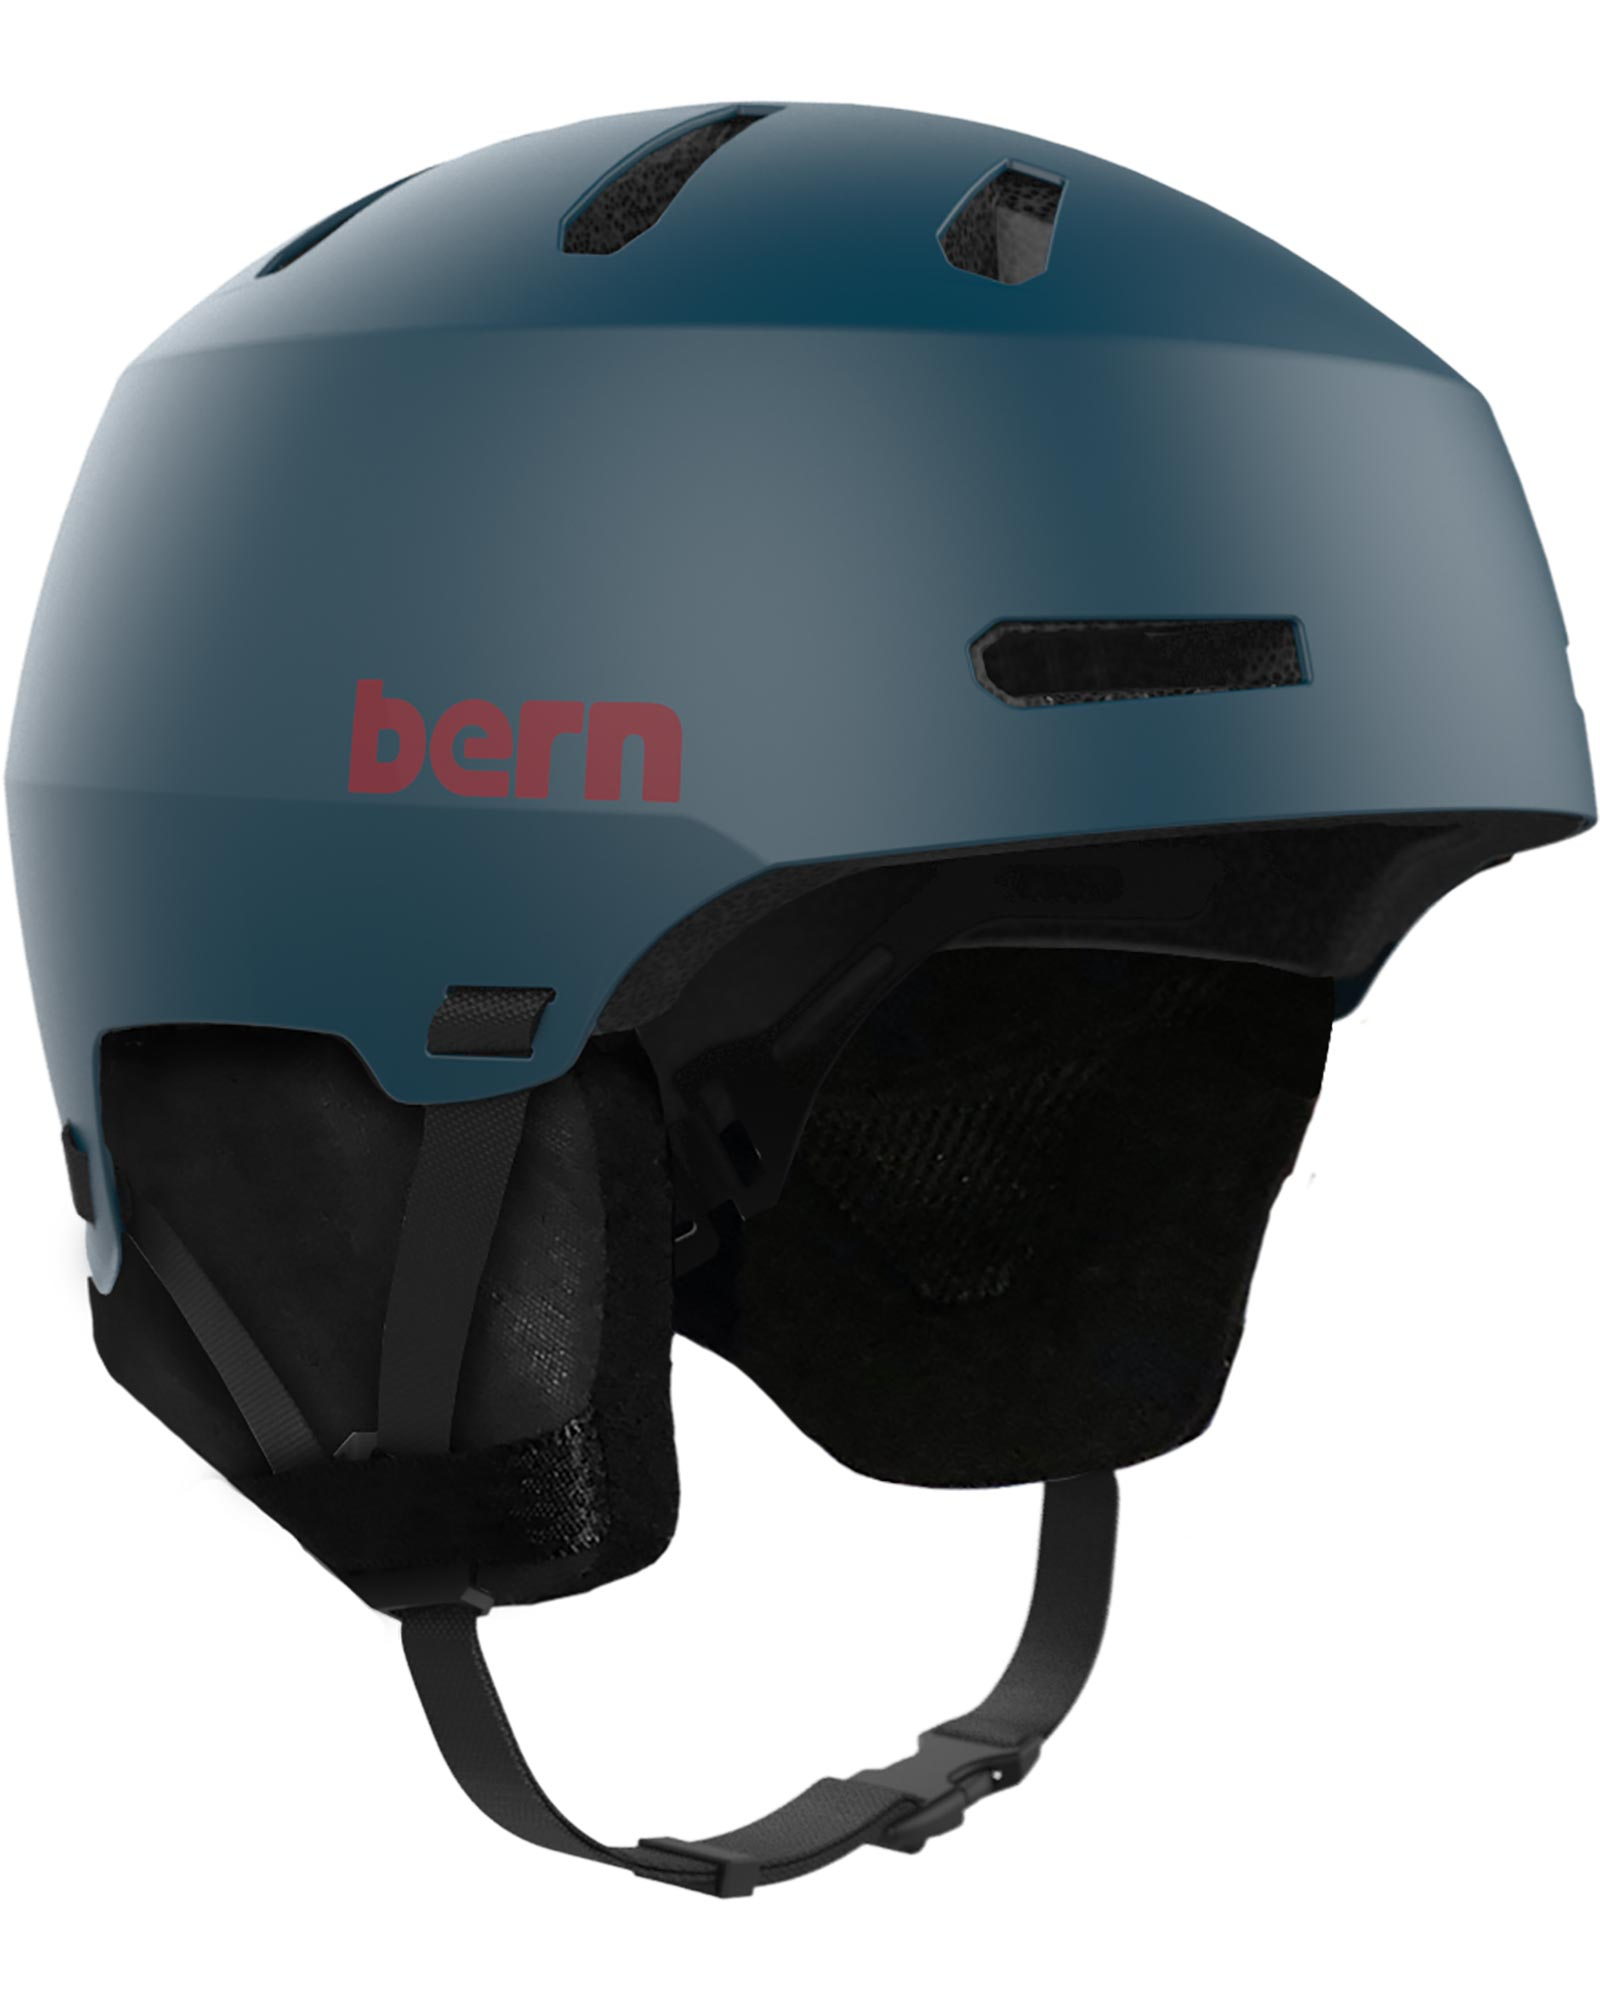 Bern Macon 2.0 MIPS Snowsports Helmet 2020 / 2021 0